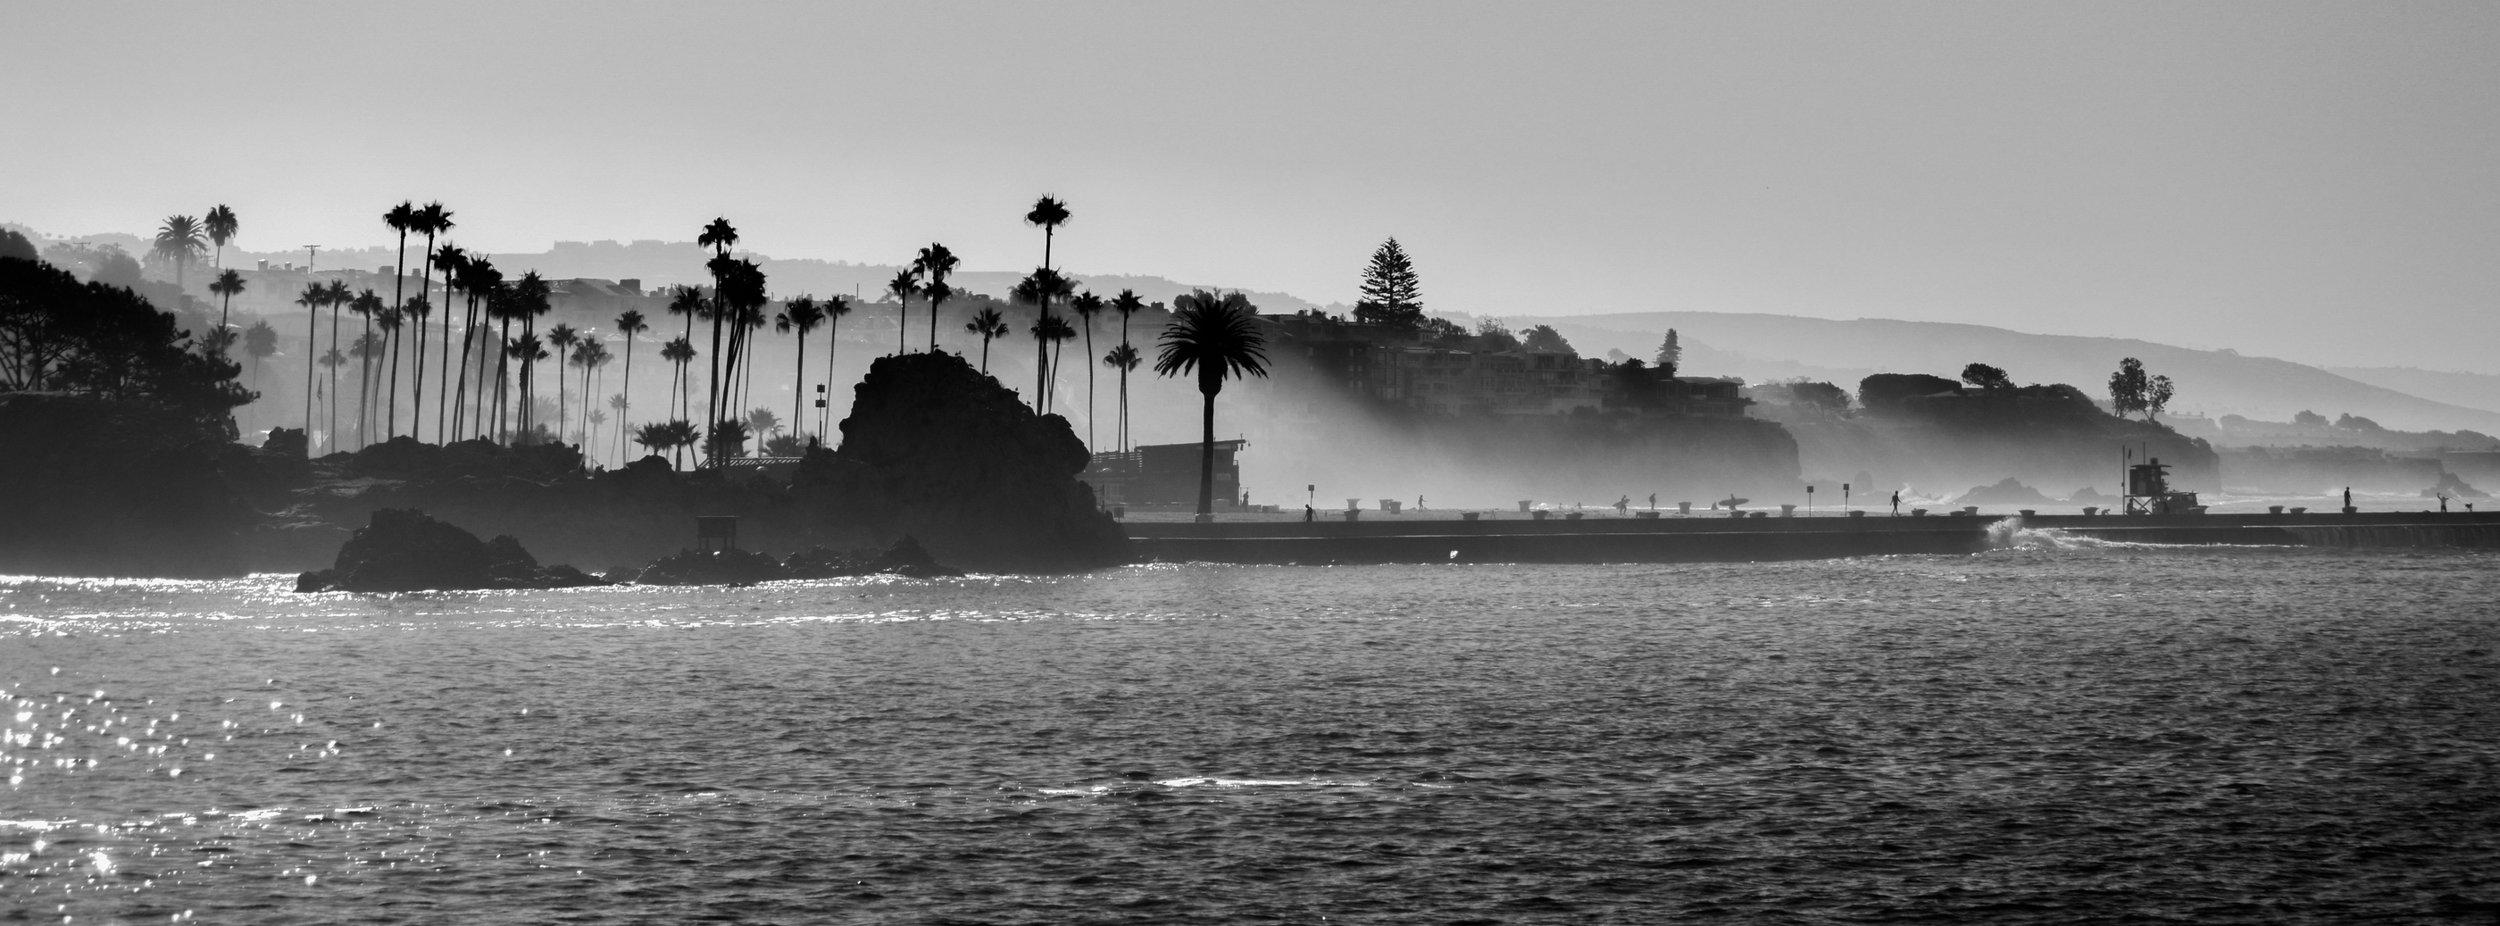 Newport Beach - California